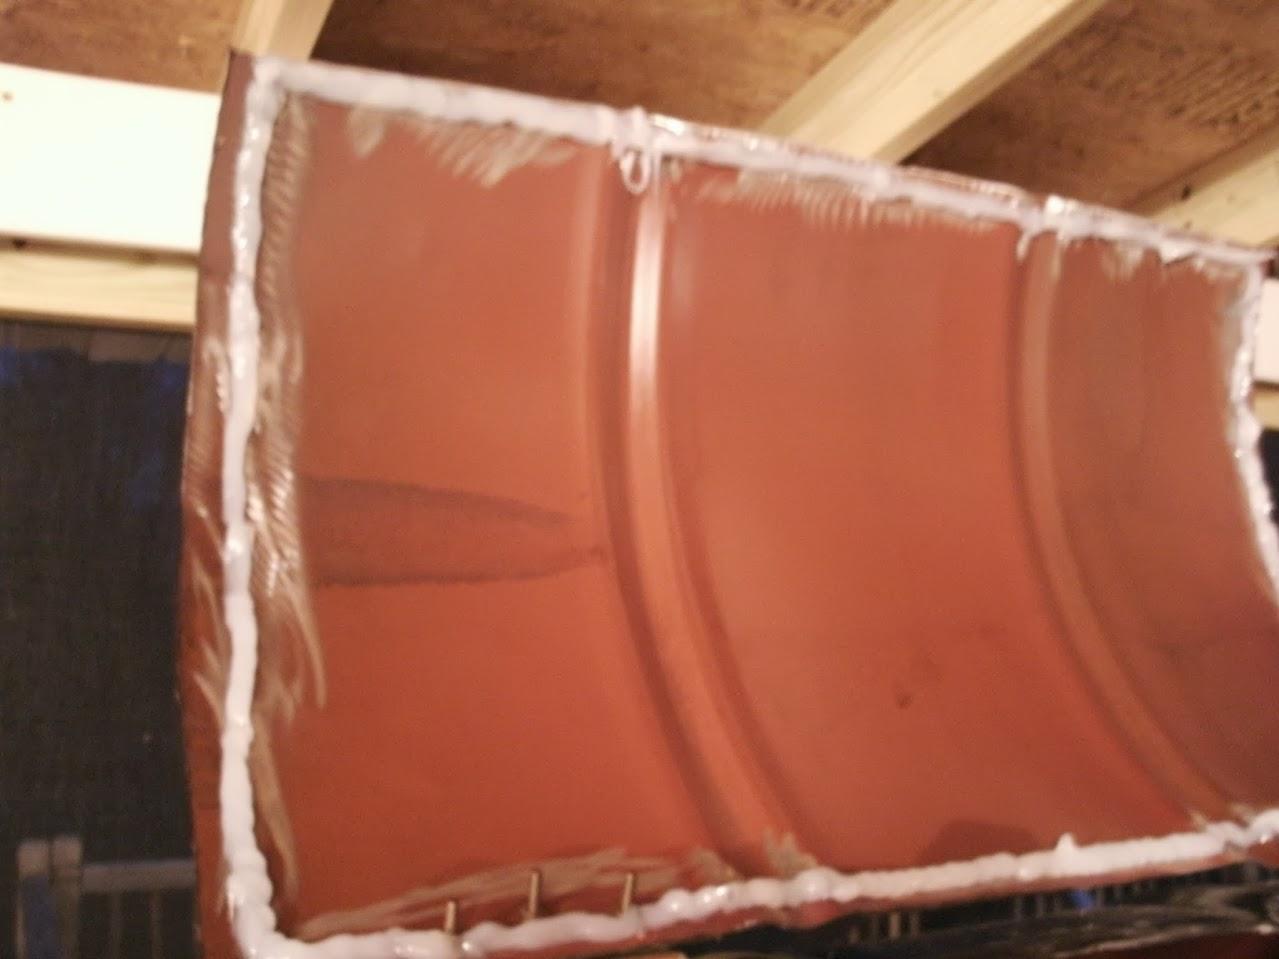 Picture of Create Door Seals and Paint